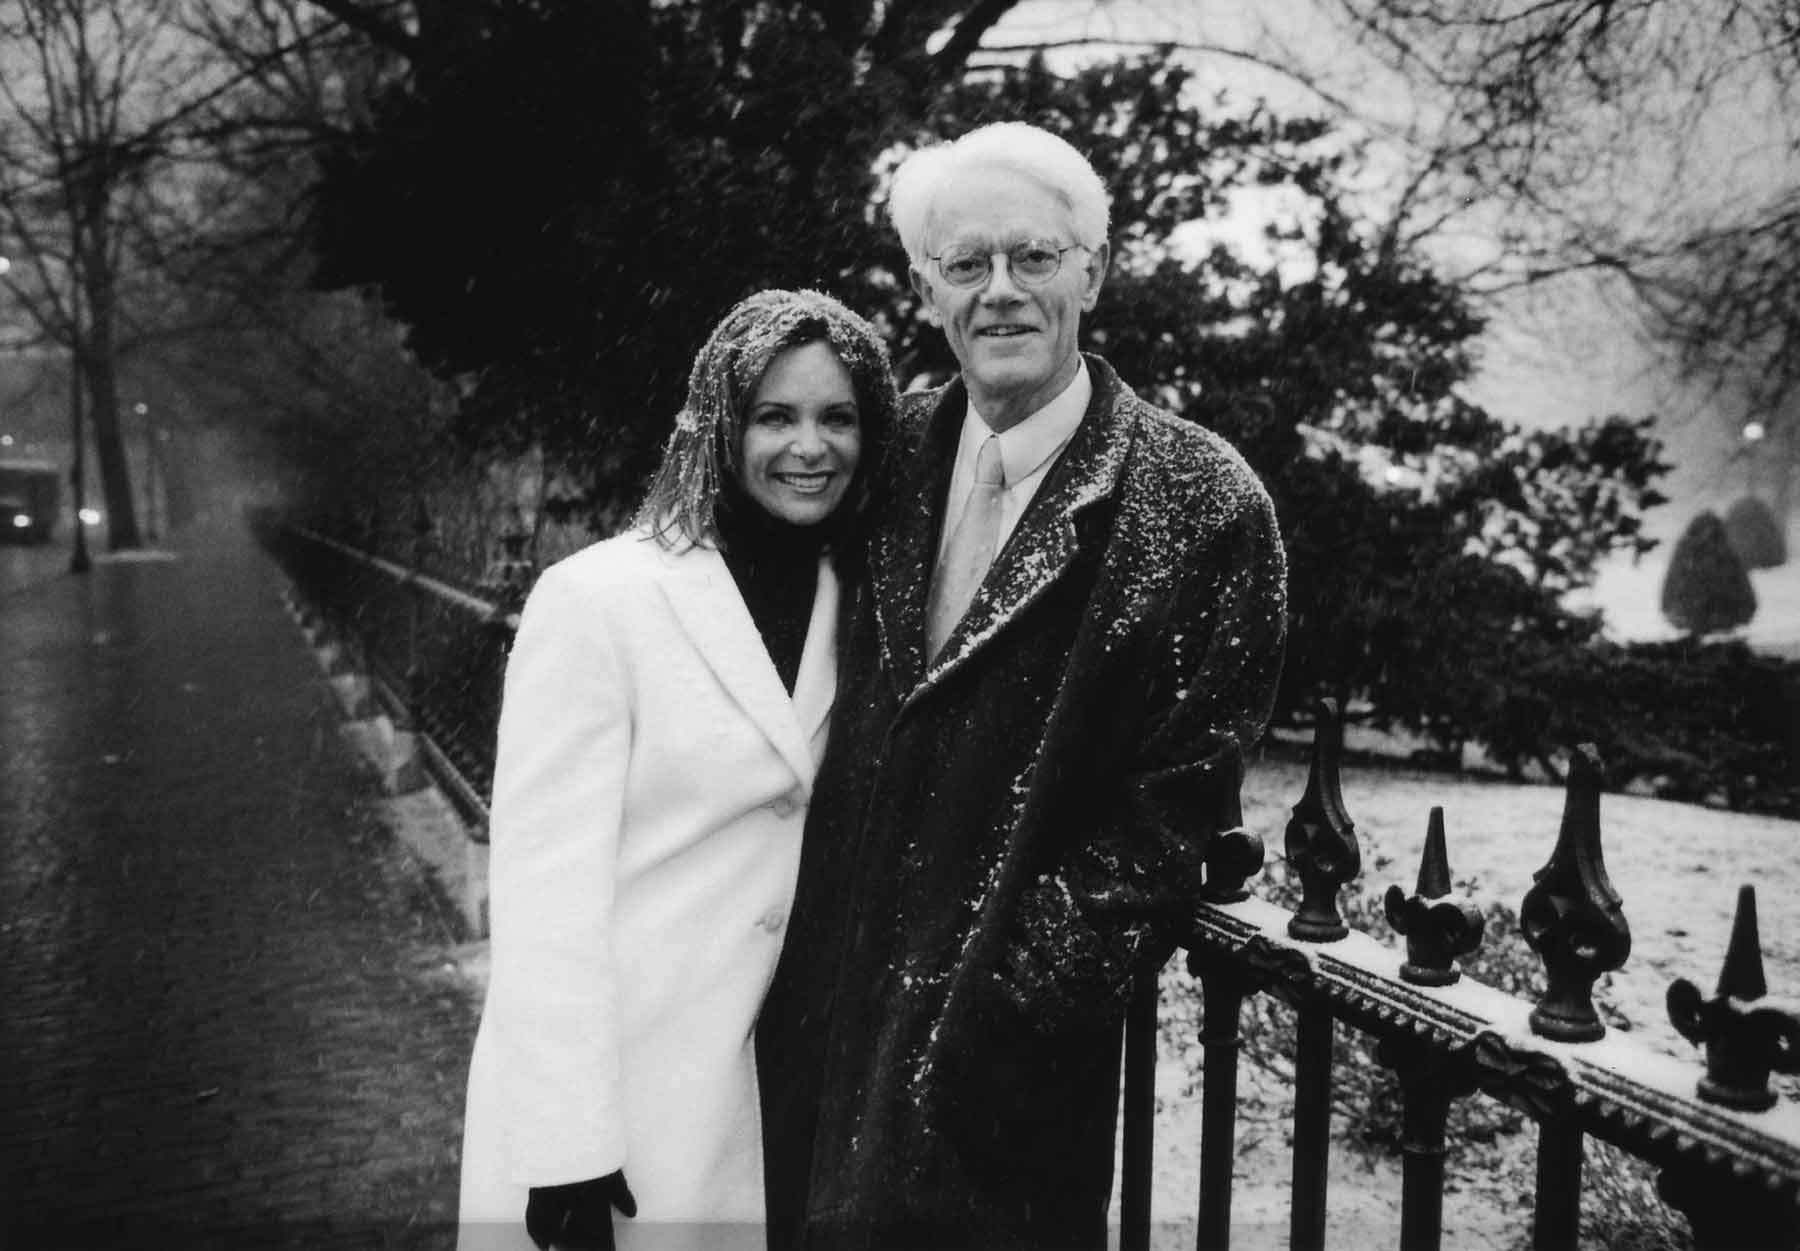 Carolyn and Peter Lynch